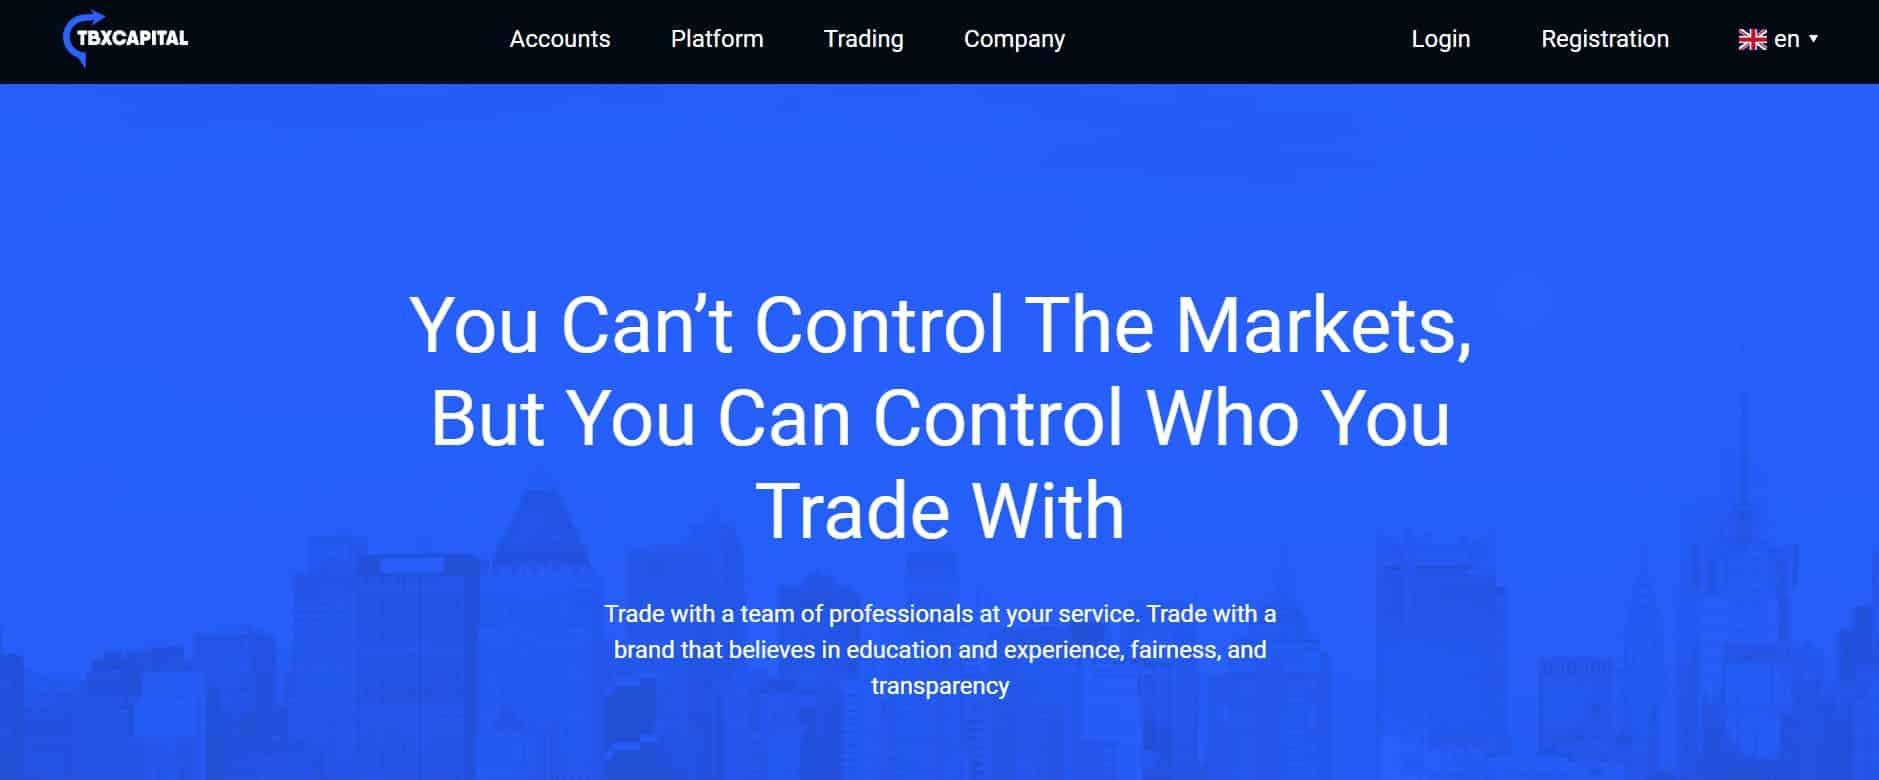 TBXCapital website